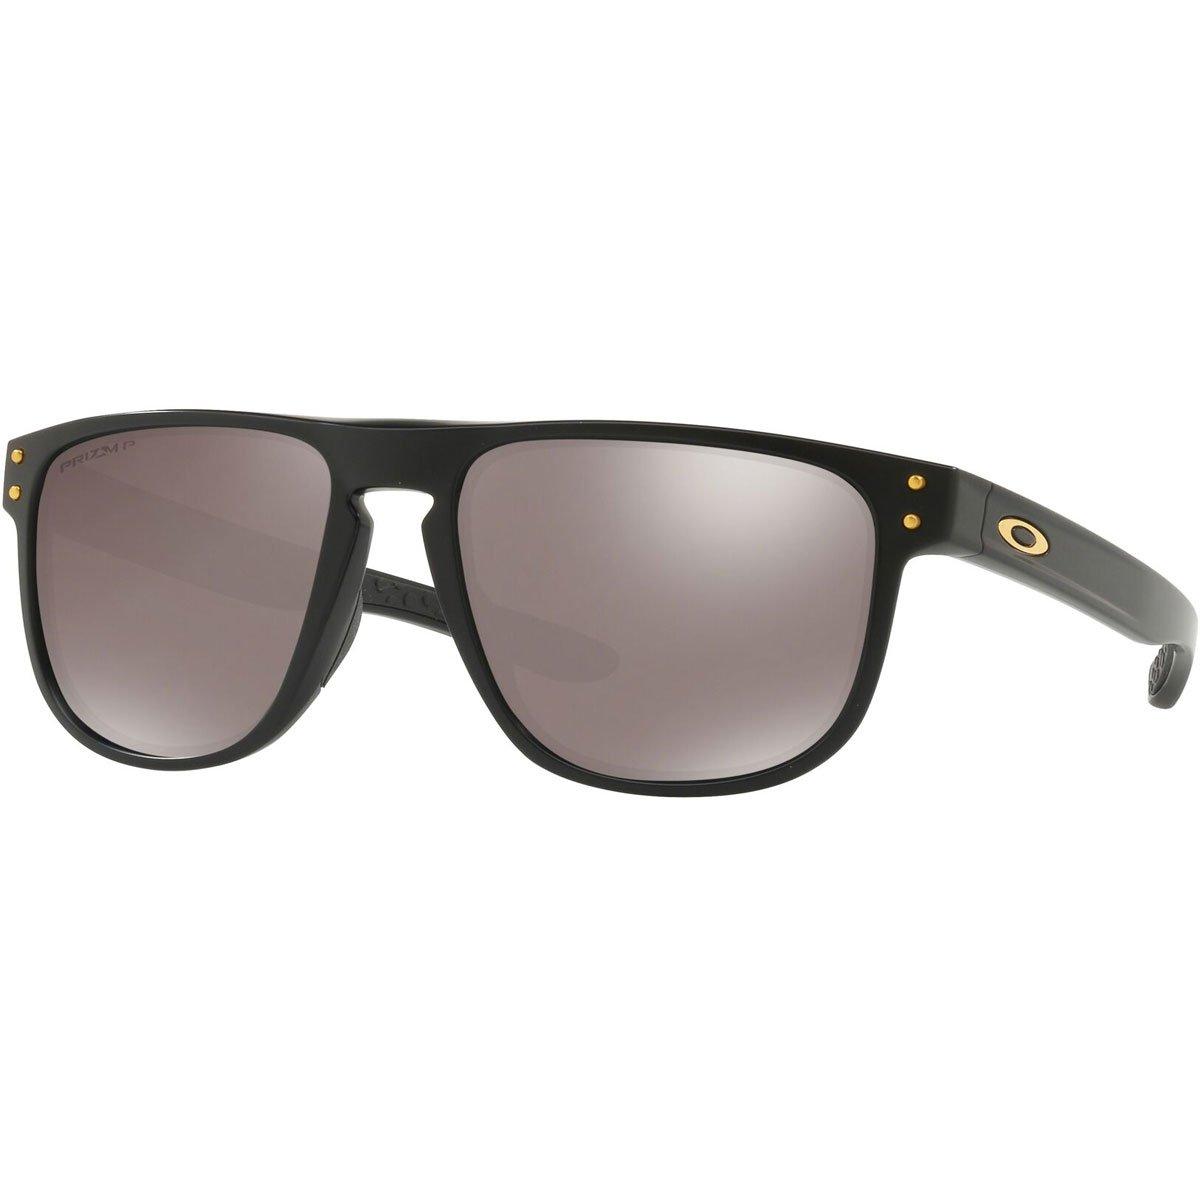 Oakley Men's OO9377 Holbrook R Square Sunglasses, Matte Black/Prizm Black Polarized, 55 mm by Oakley